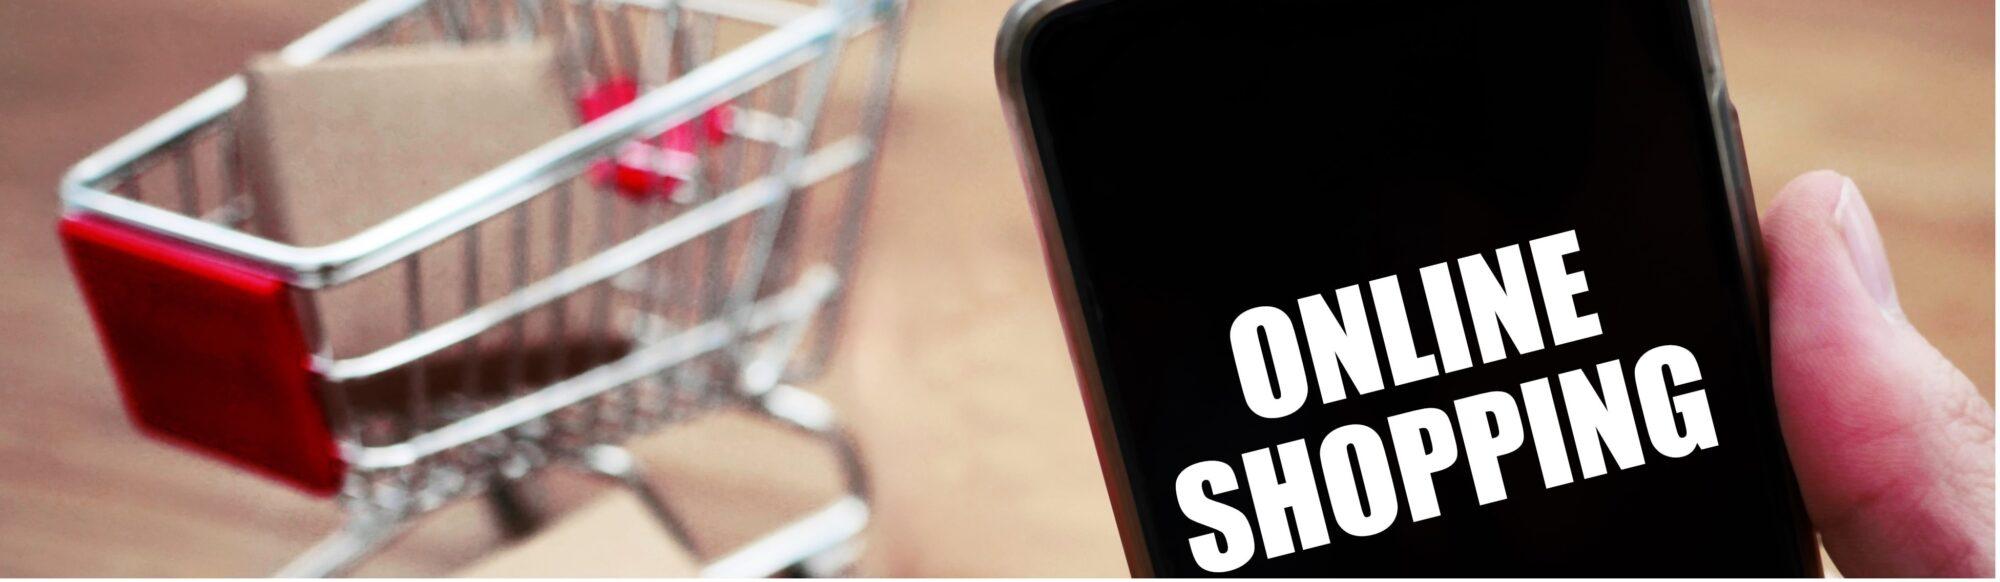 shop on line -spesa on line-marketing on line-booking on line